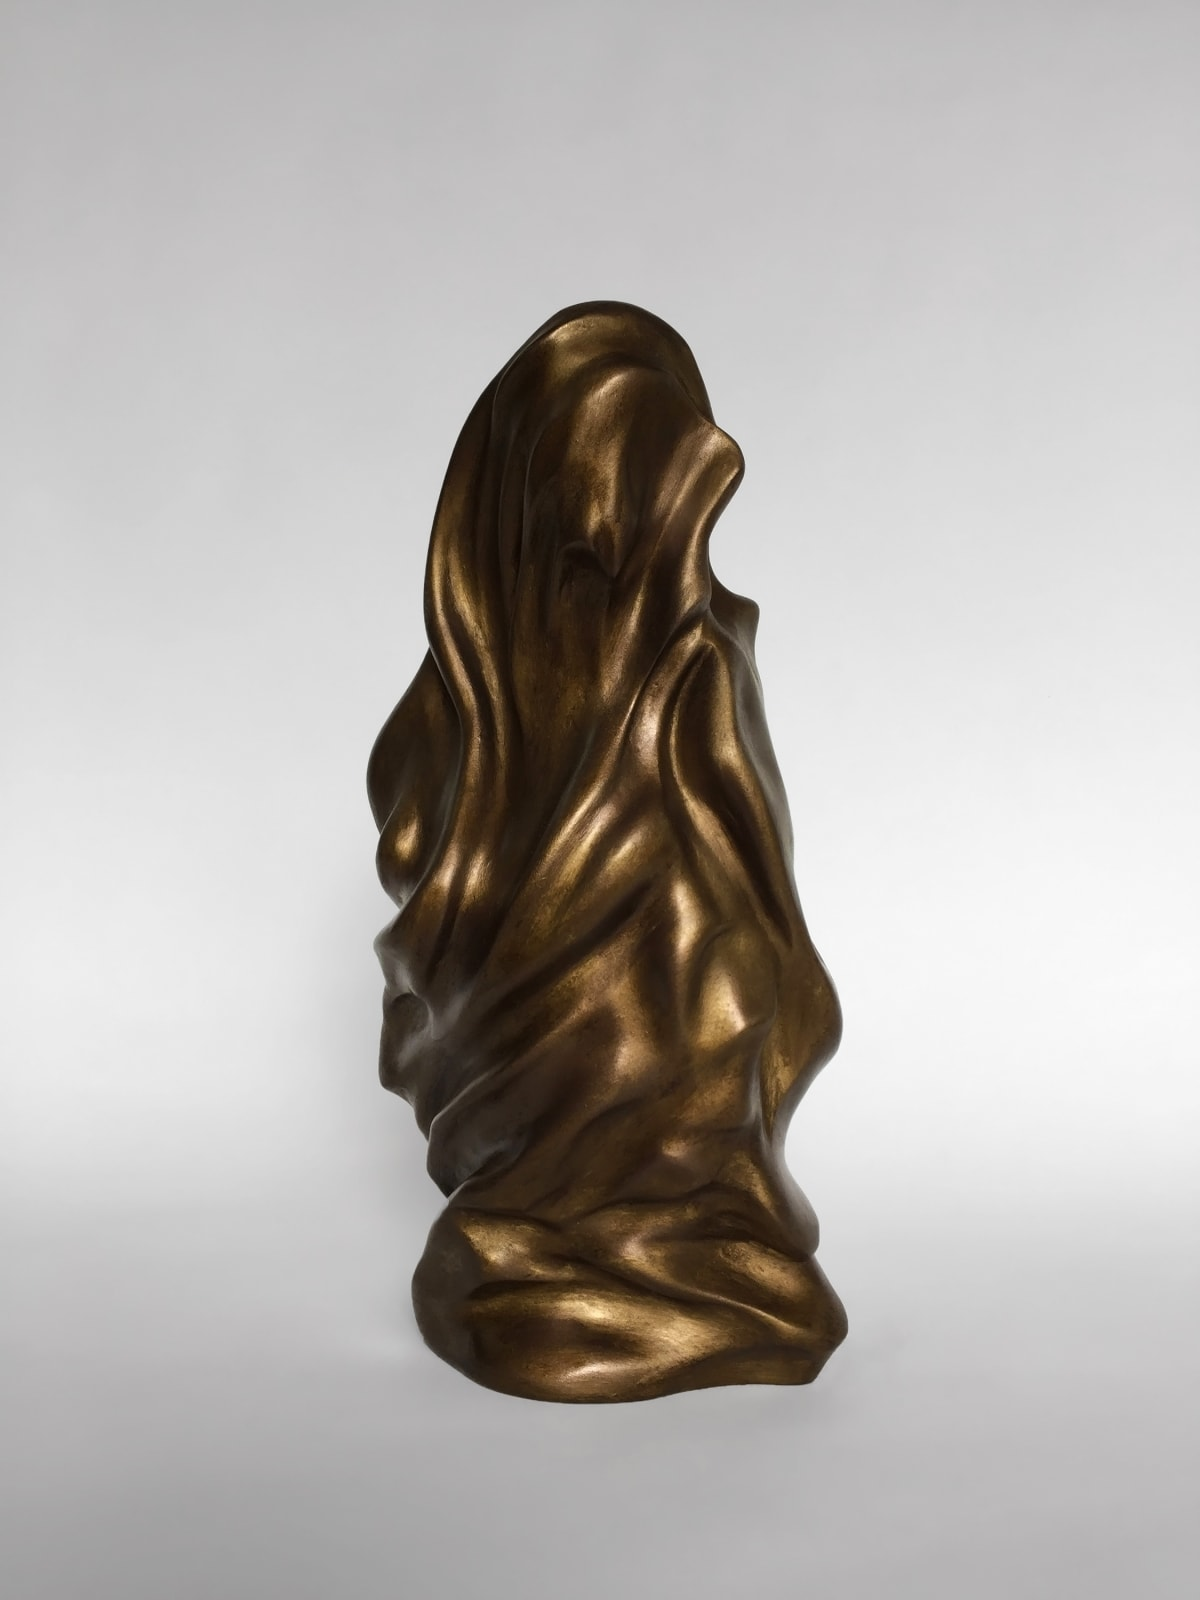 Richard Stone, Bird Gerhl, 2017-2019 Bronze resin composite 35 x 25 x 20 cm